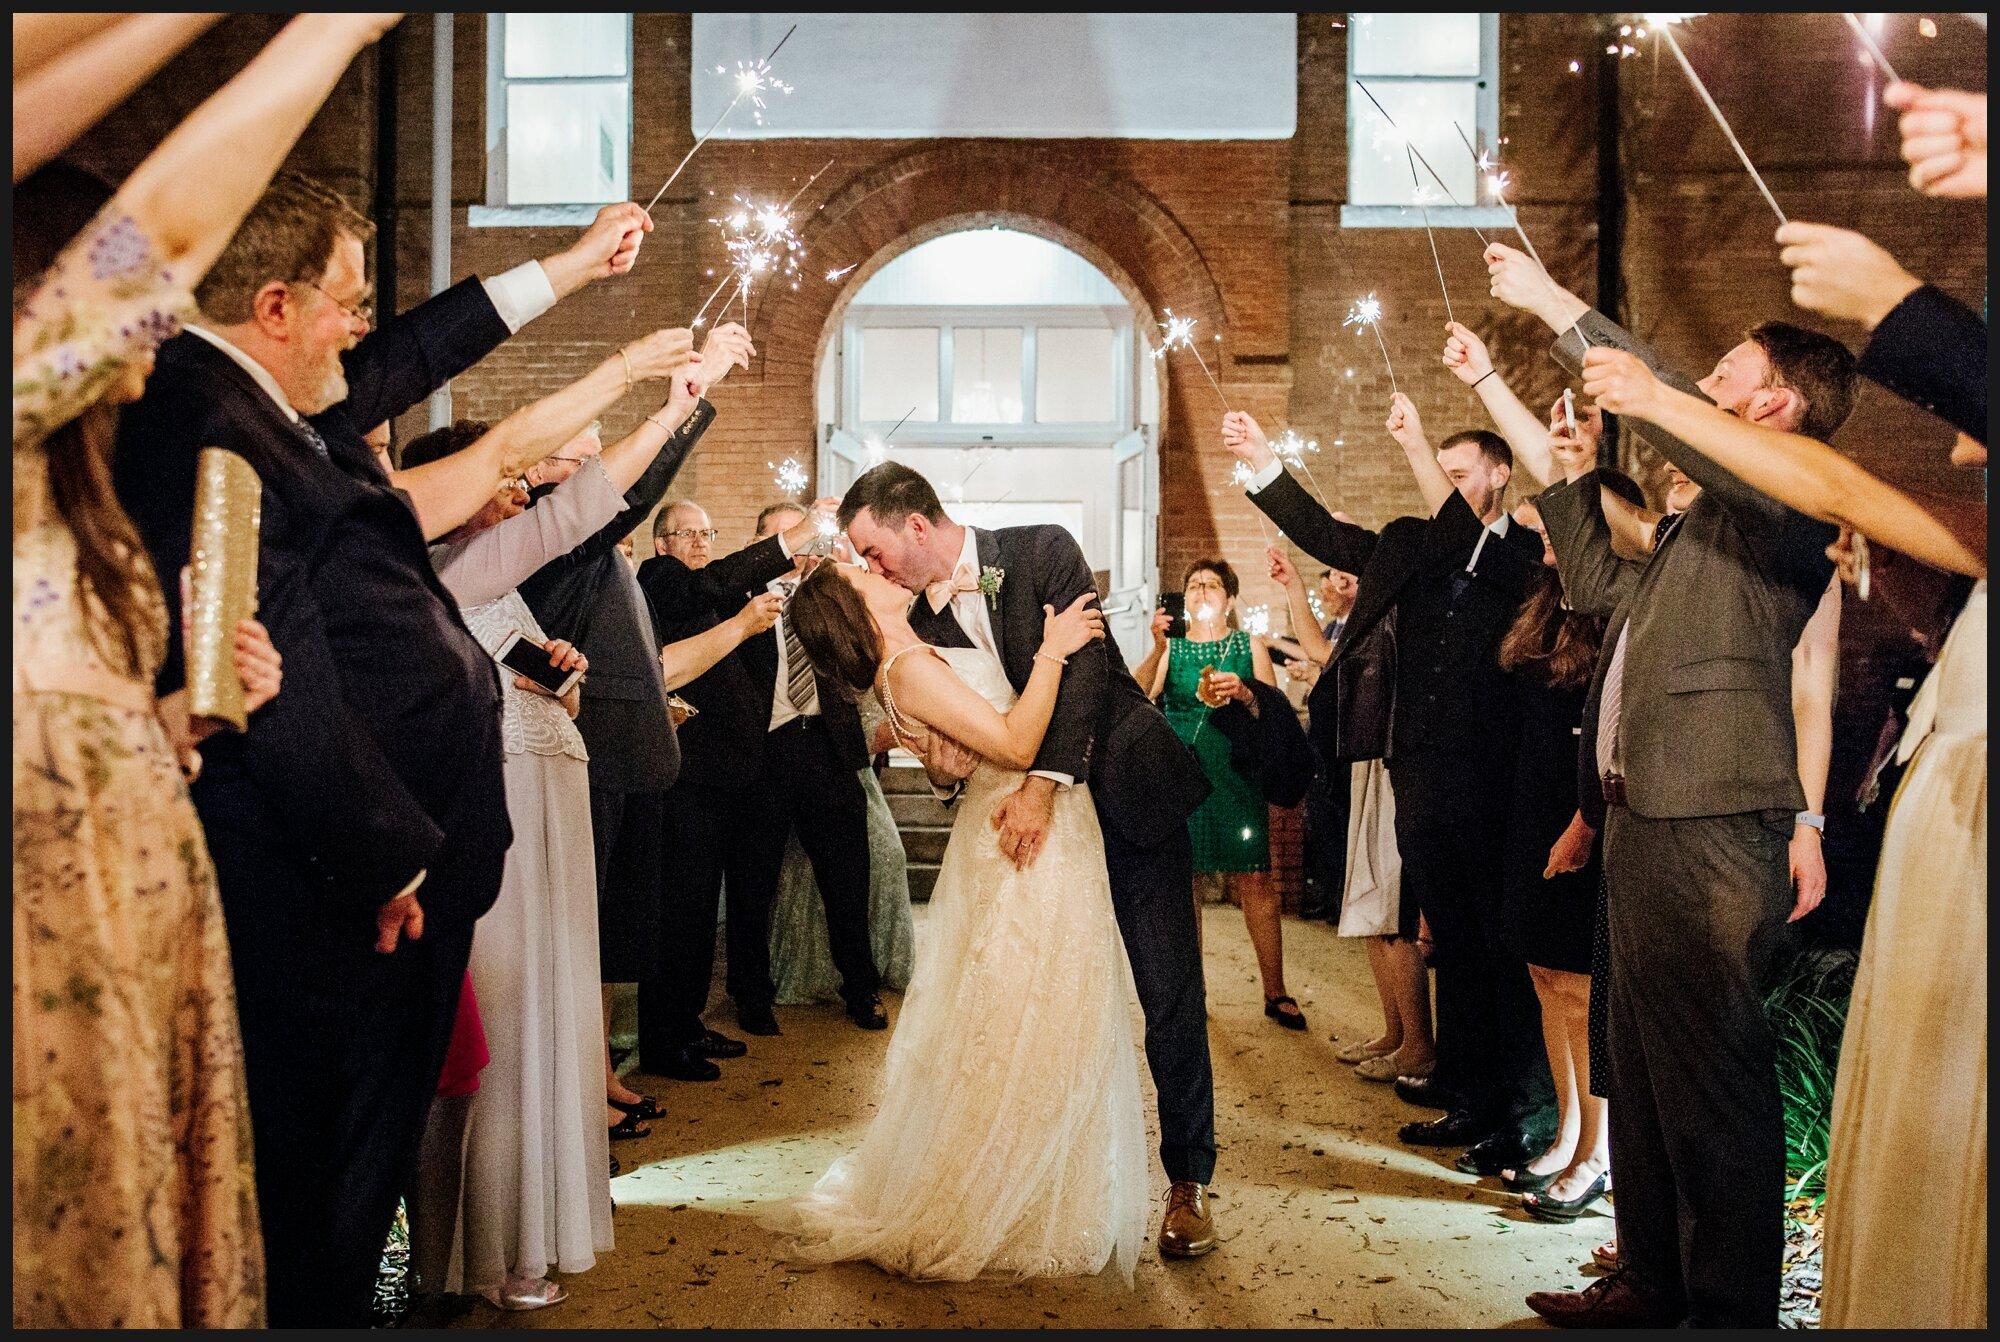 Orlando-Wedding-Photographer-destination-wedding-photographer-florida-wedding-photographer-hawaii-wedding-photographer_0696.jpg